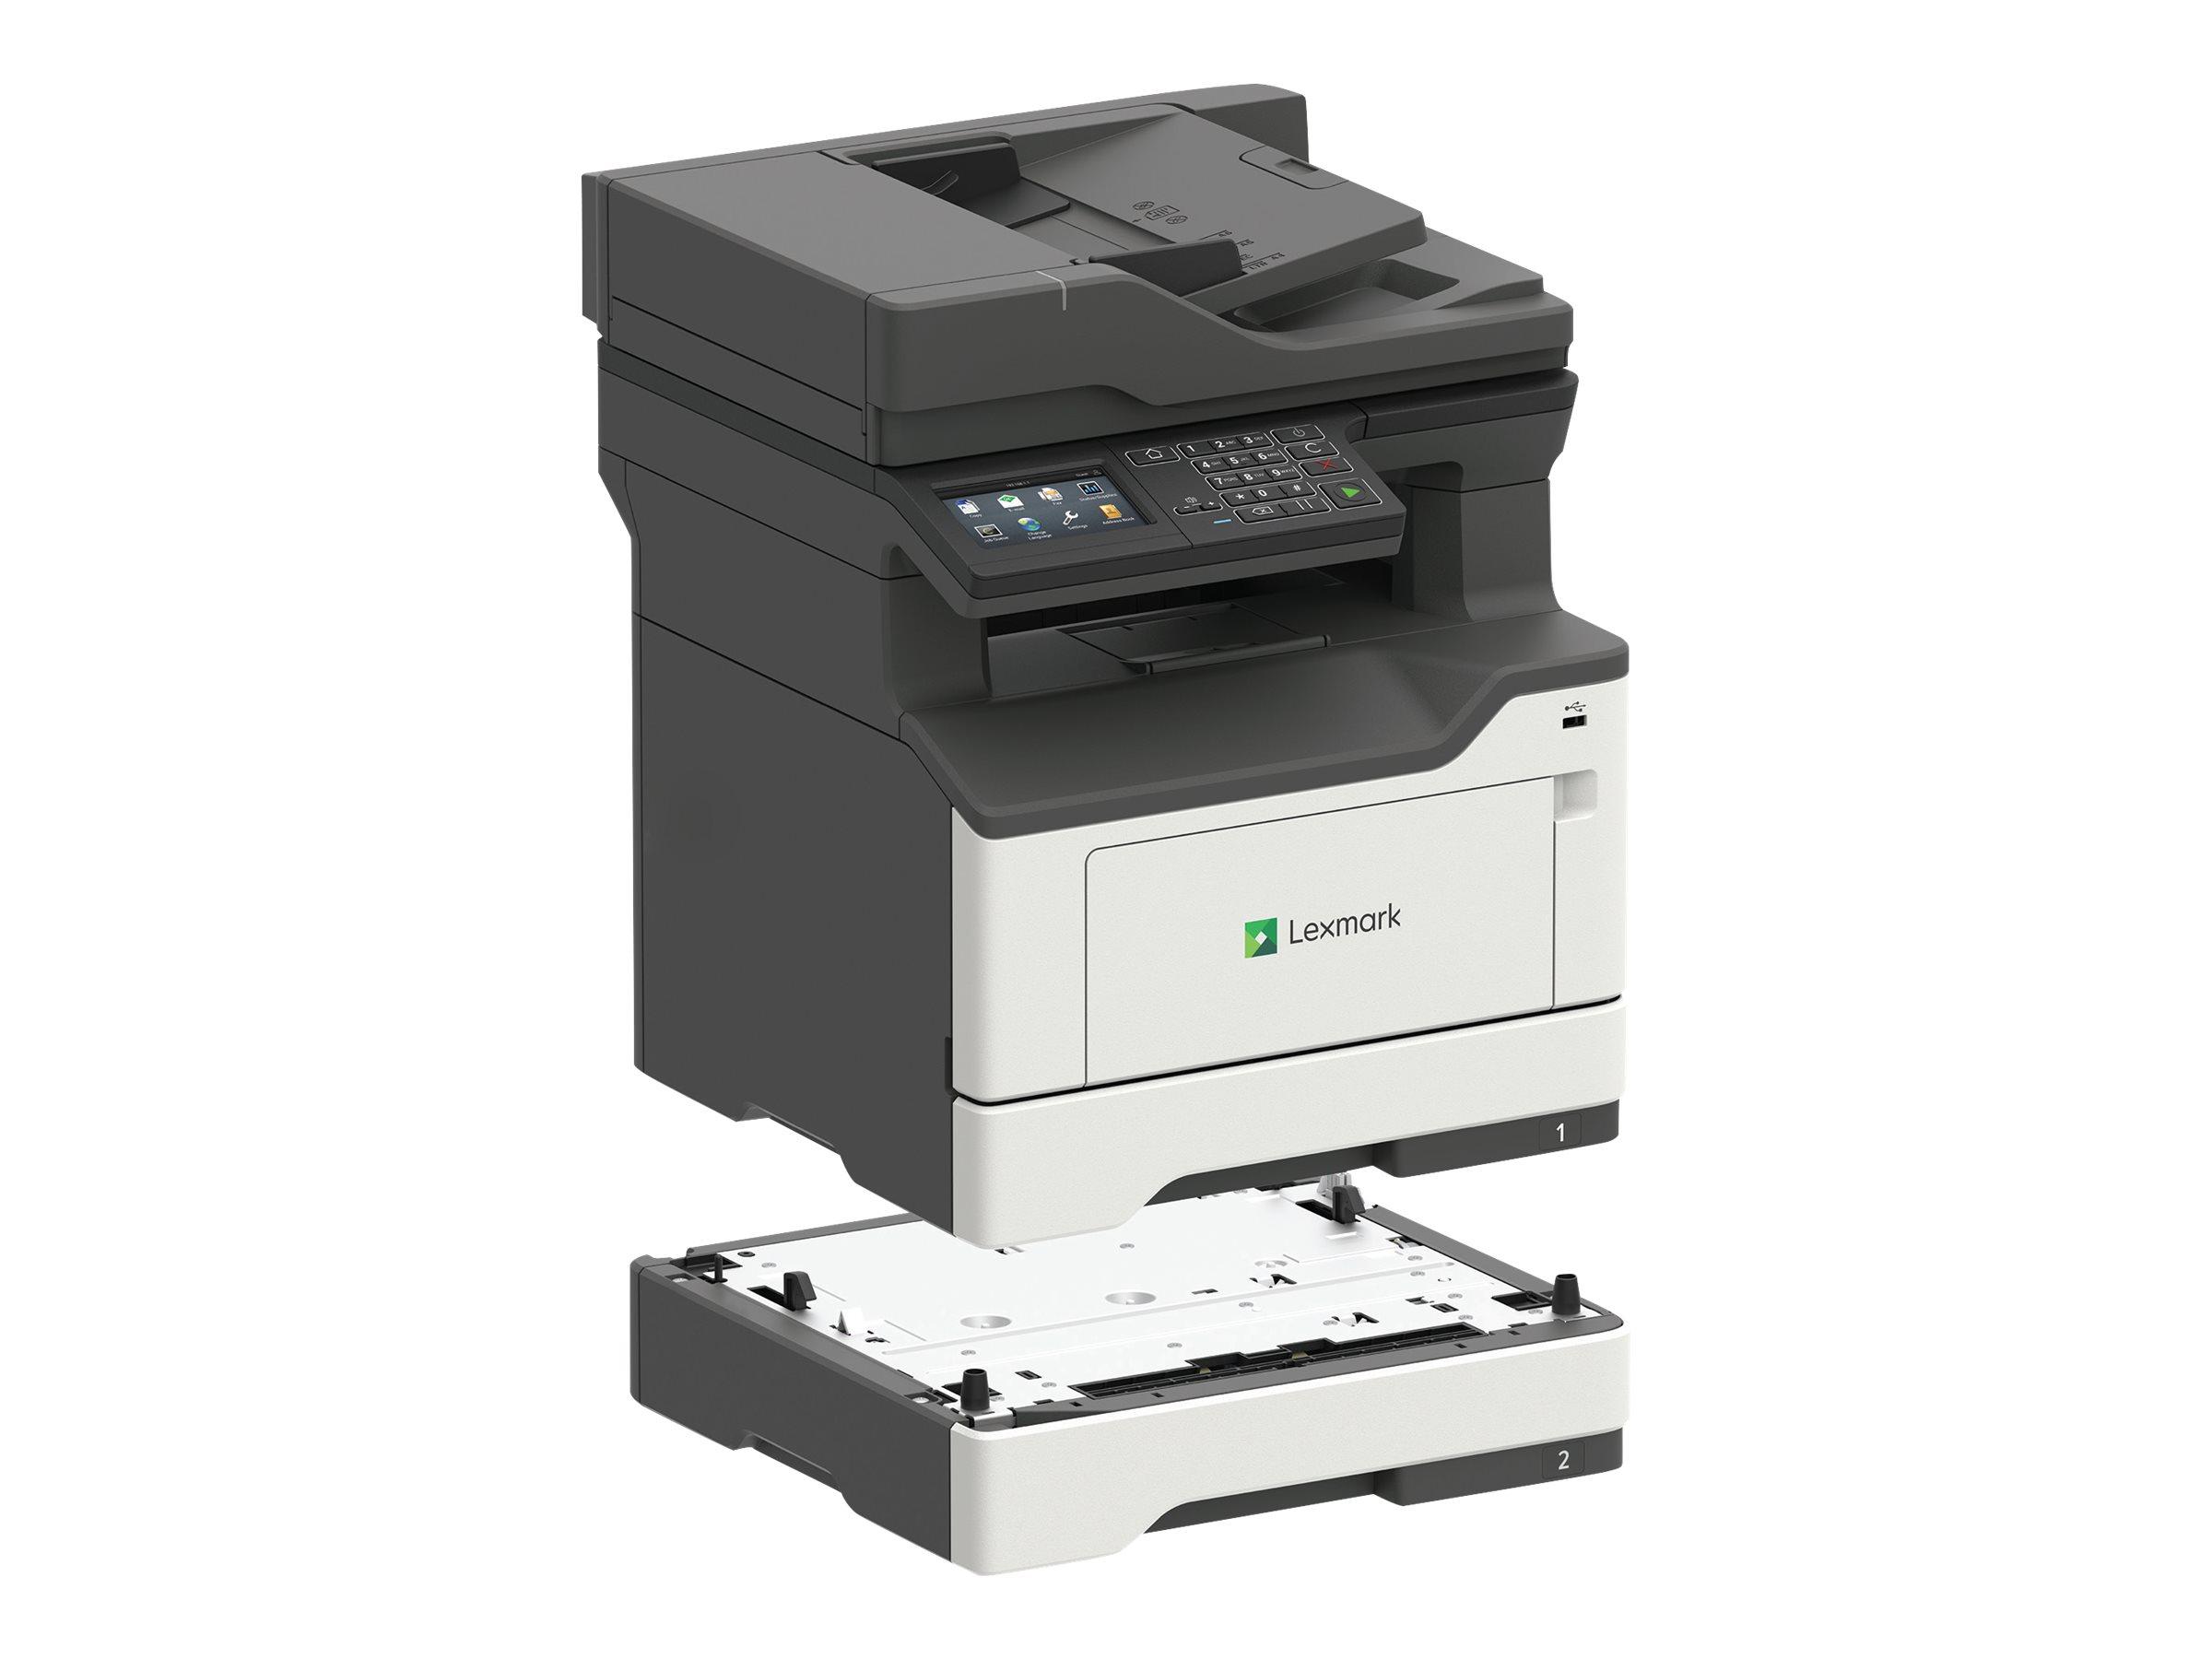 Lexmark MX421ade - Multifunktionsdrucker - s/w - Laser - 215.9 x 355.6 mm (Original)